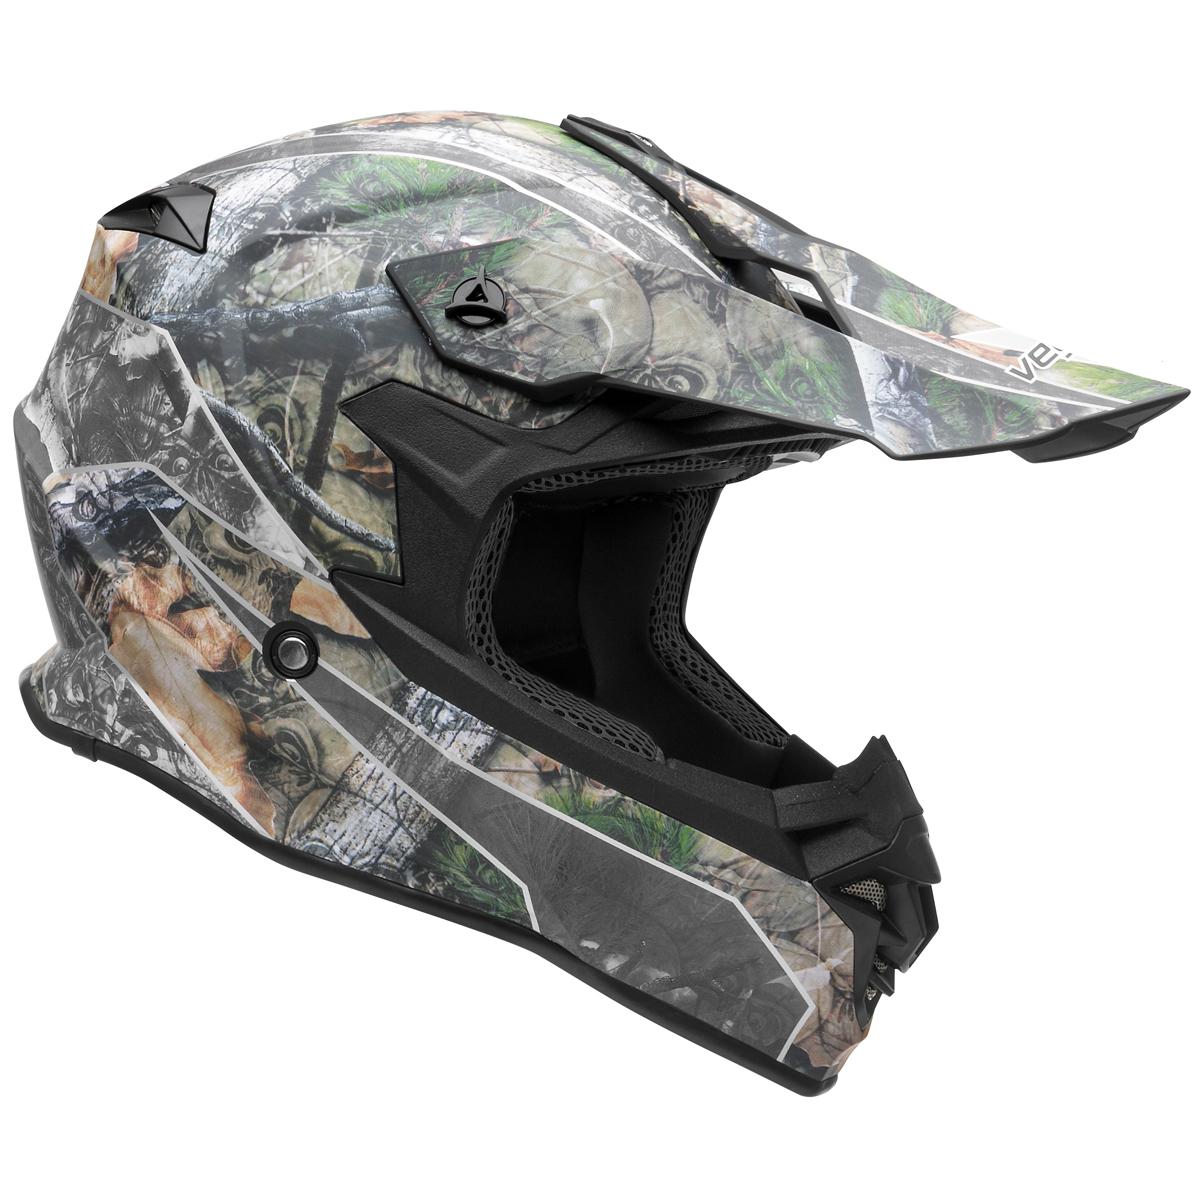 Vega V-Flow Skull Camo MX Offroad Helmet Green Camo MD